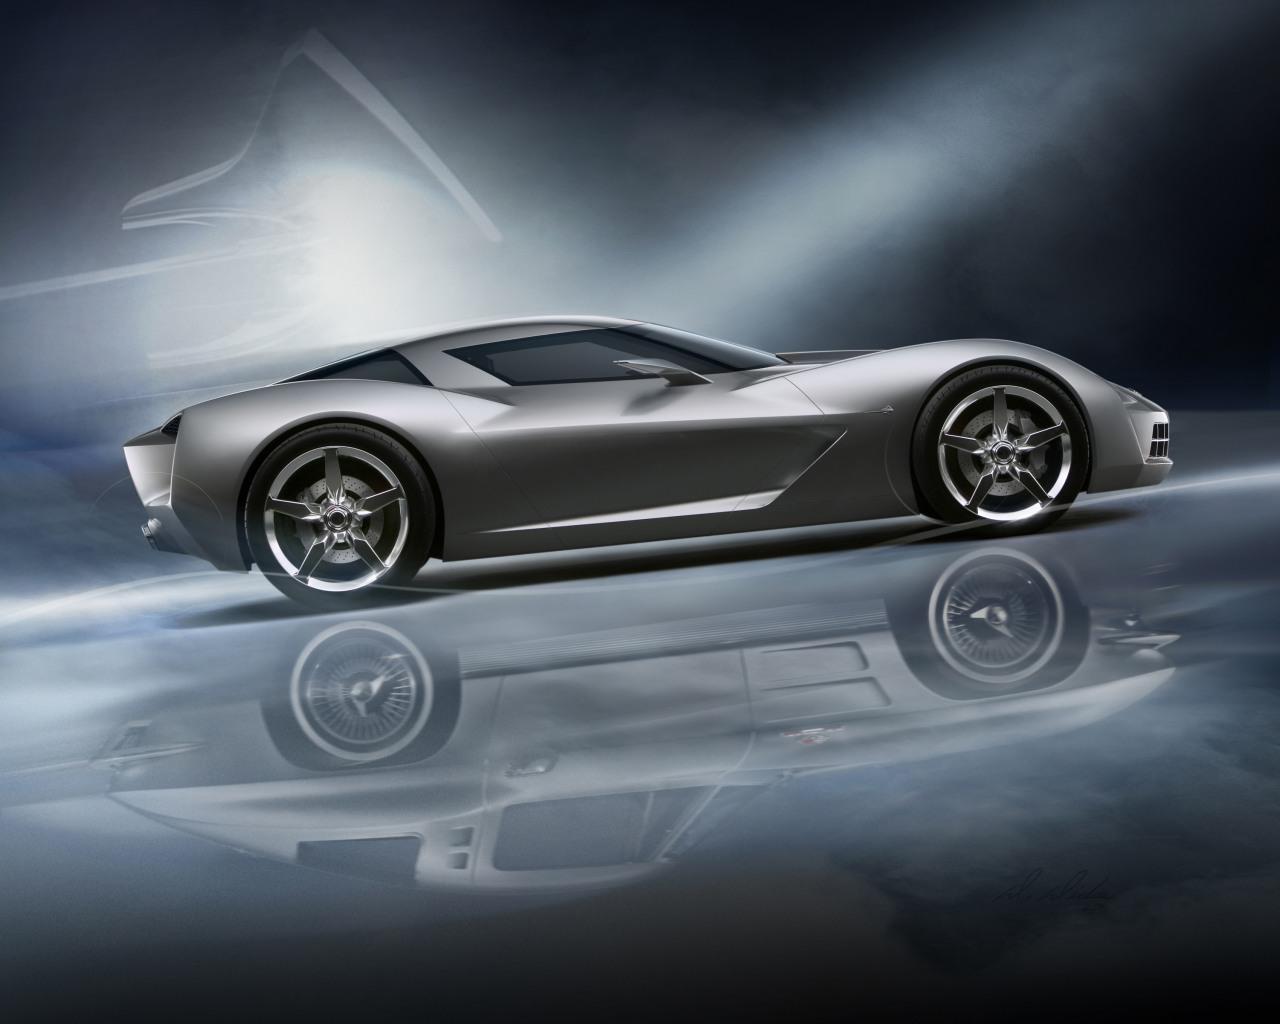 Corvette_Stingray_Concept_Transformers2009-1.jpg